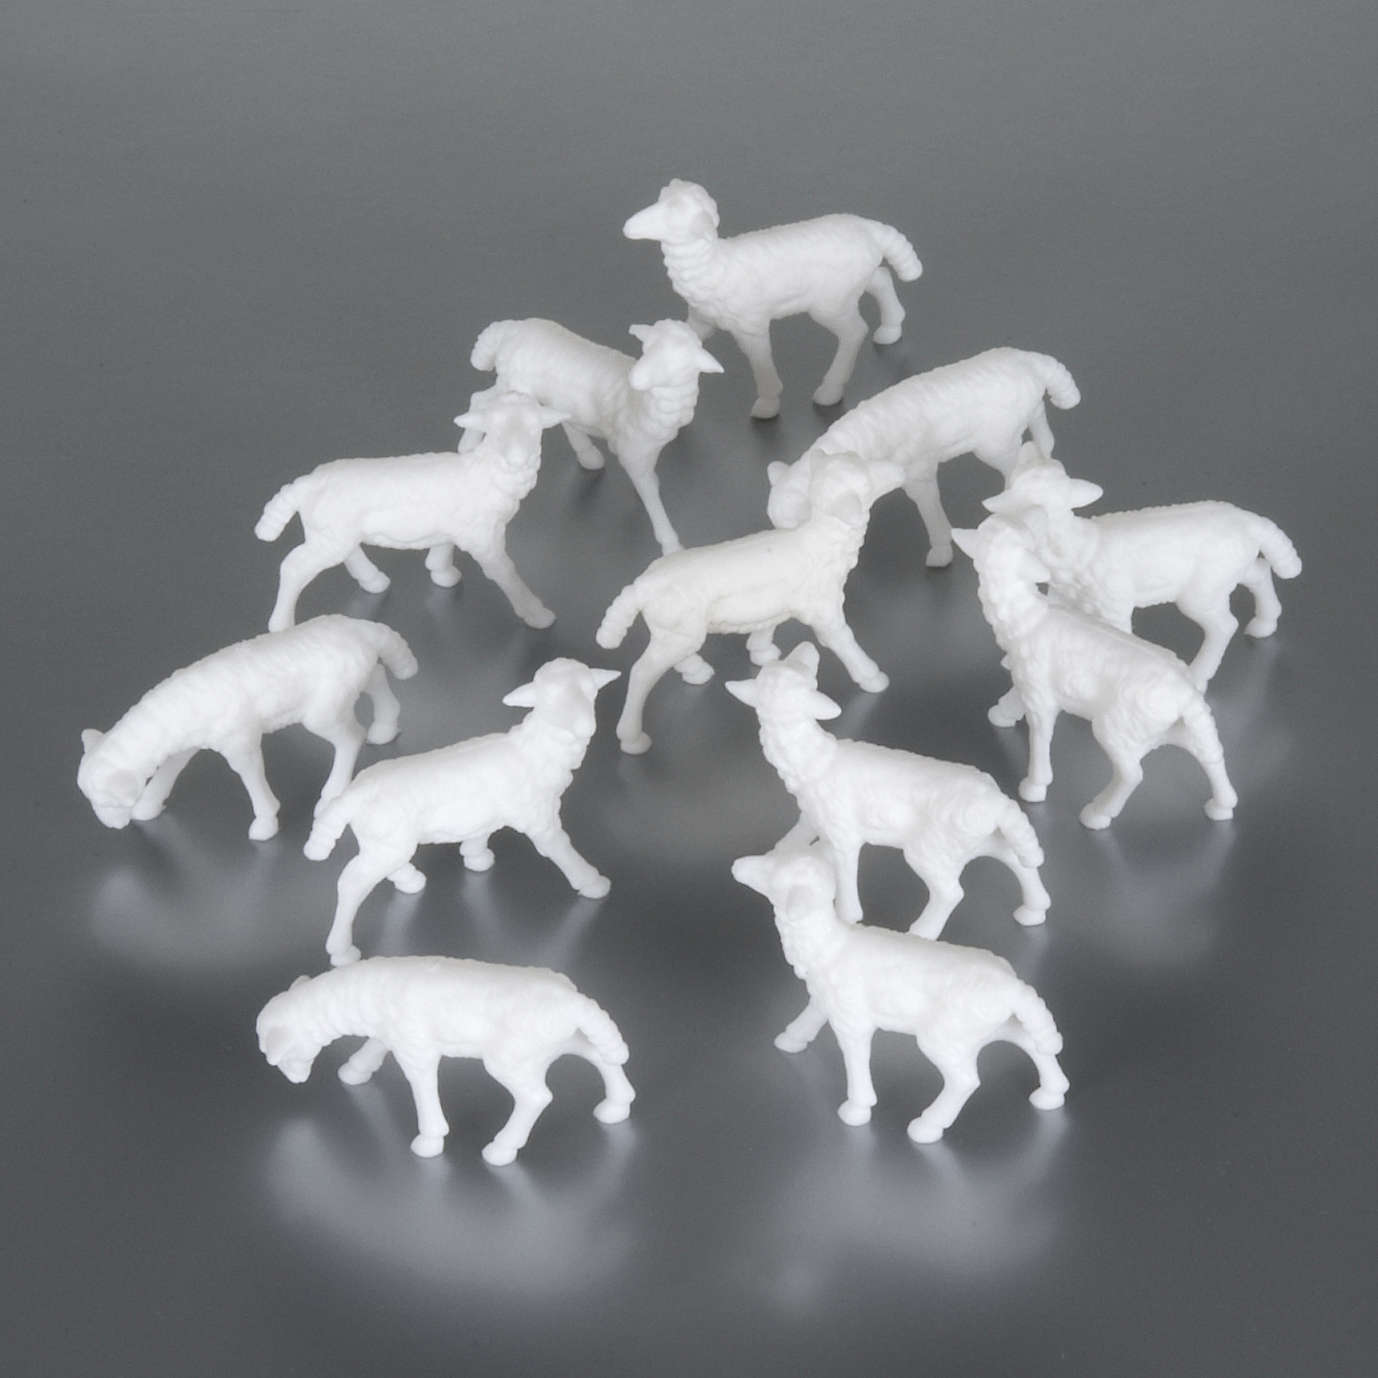 Sheep cm 8-10, 12 pcs set nativity figurines 3